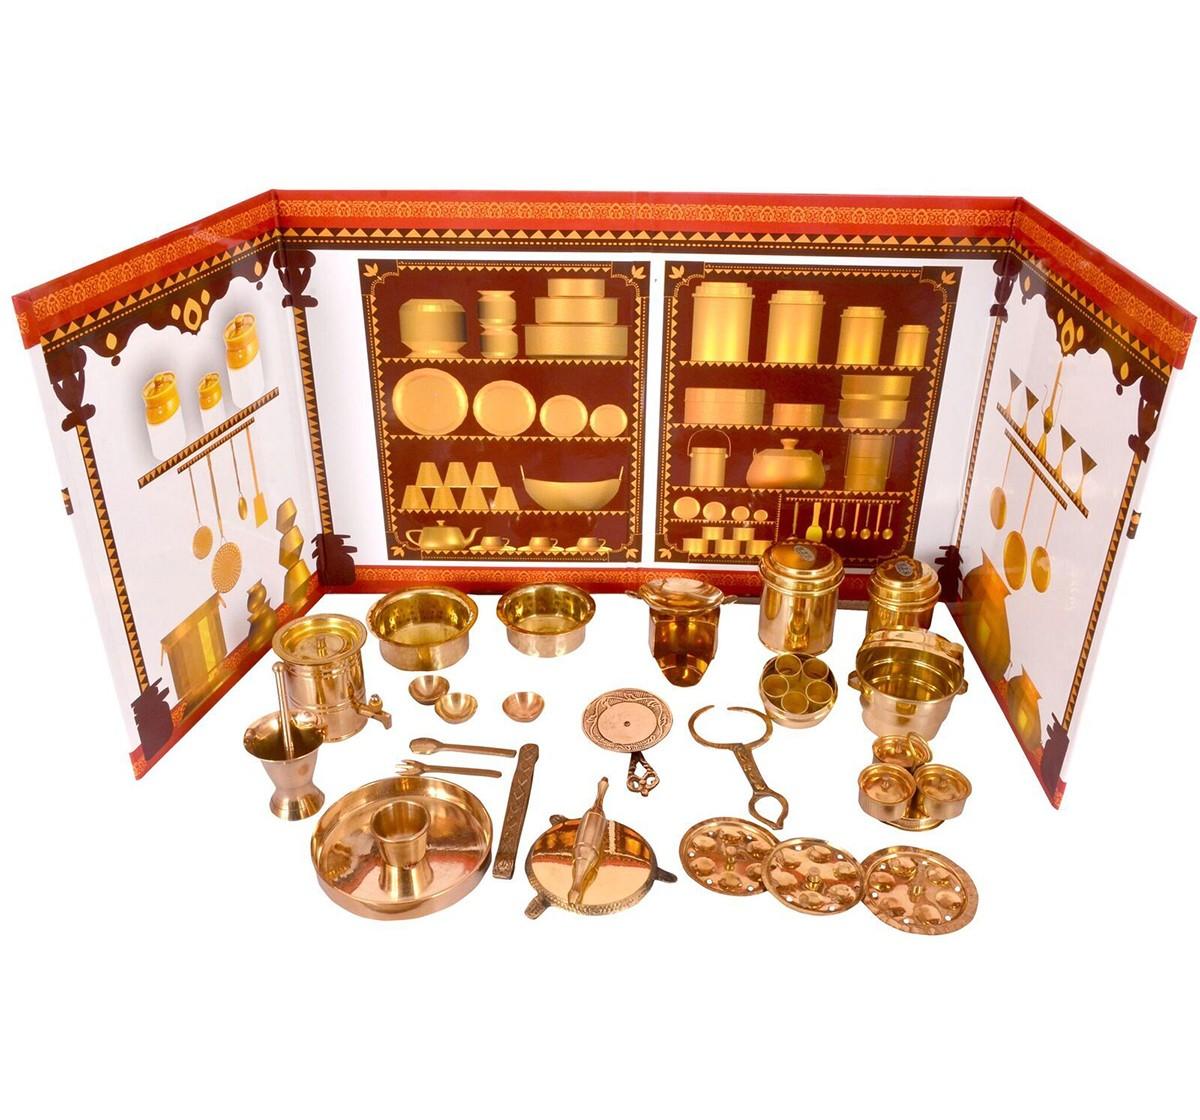 Desi Toys Premium Brass Roleplay Kitchen Set for Kids age 5Y+ (Golden)